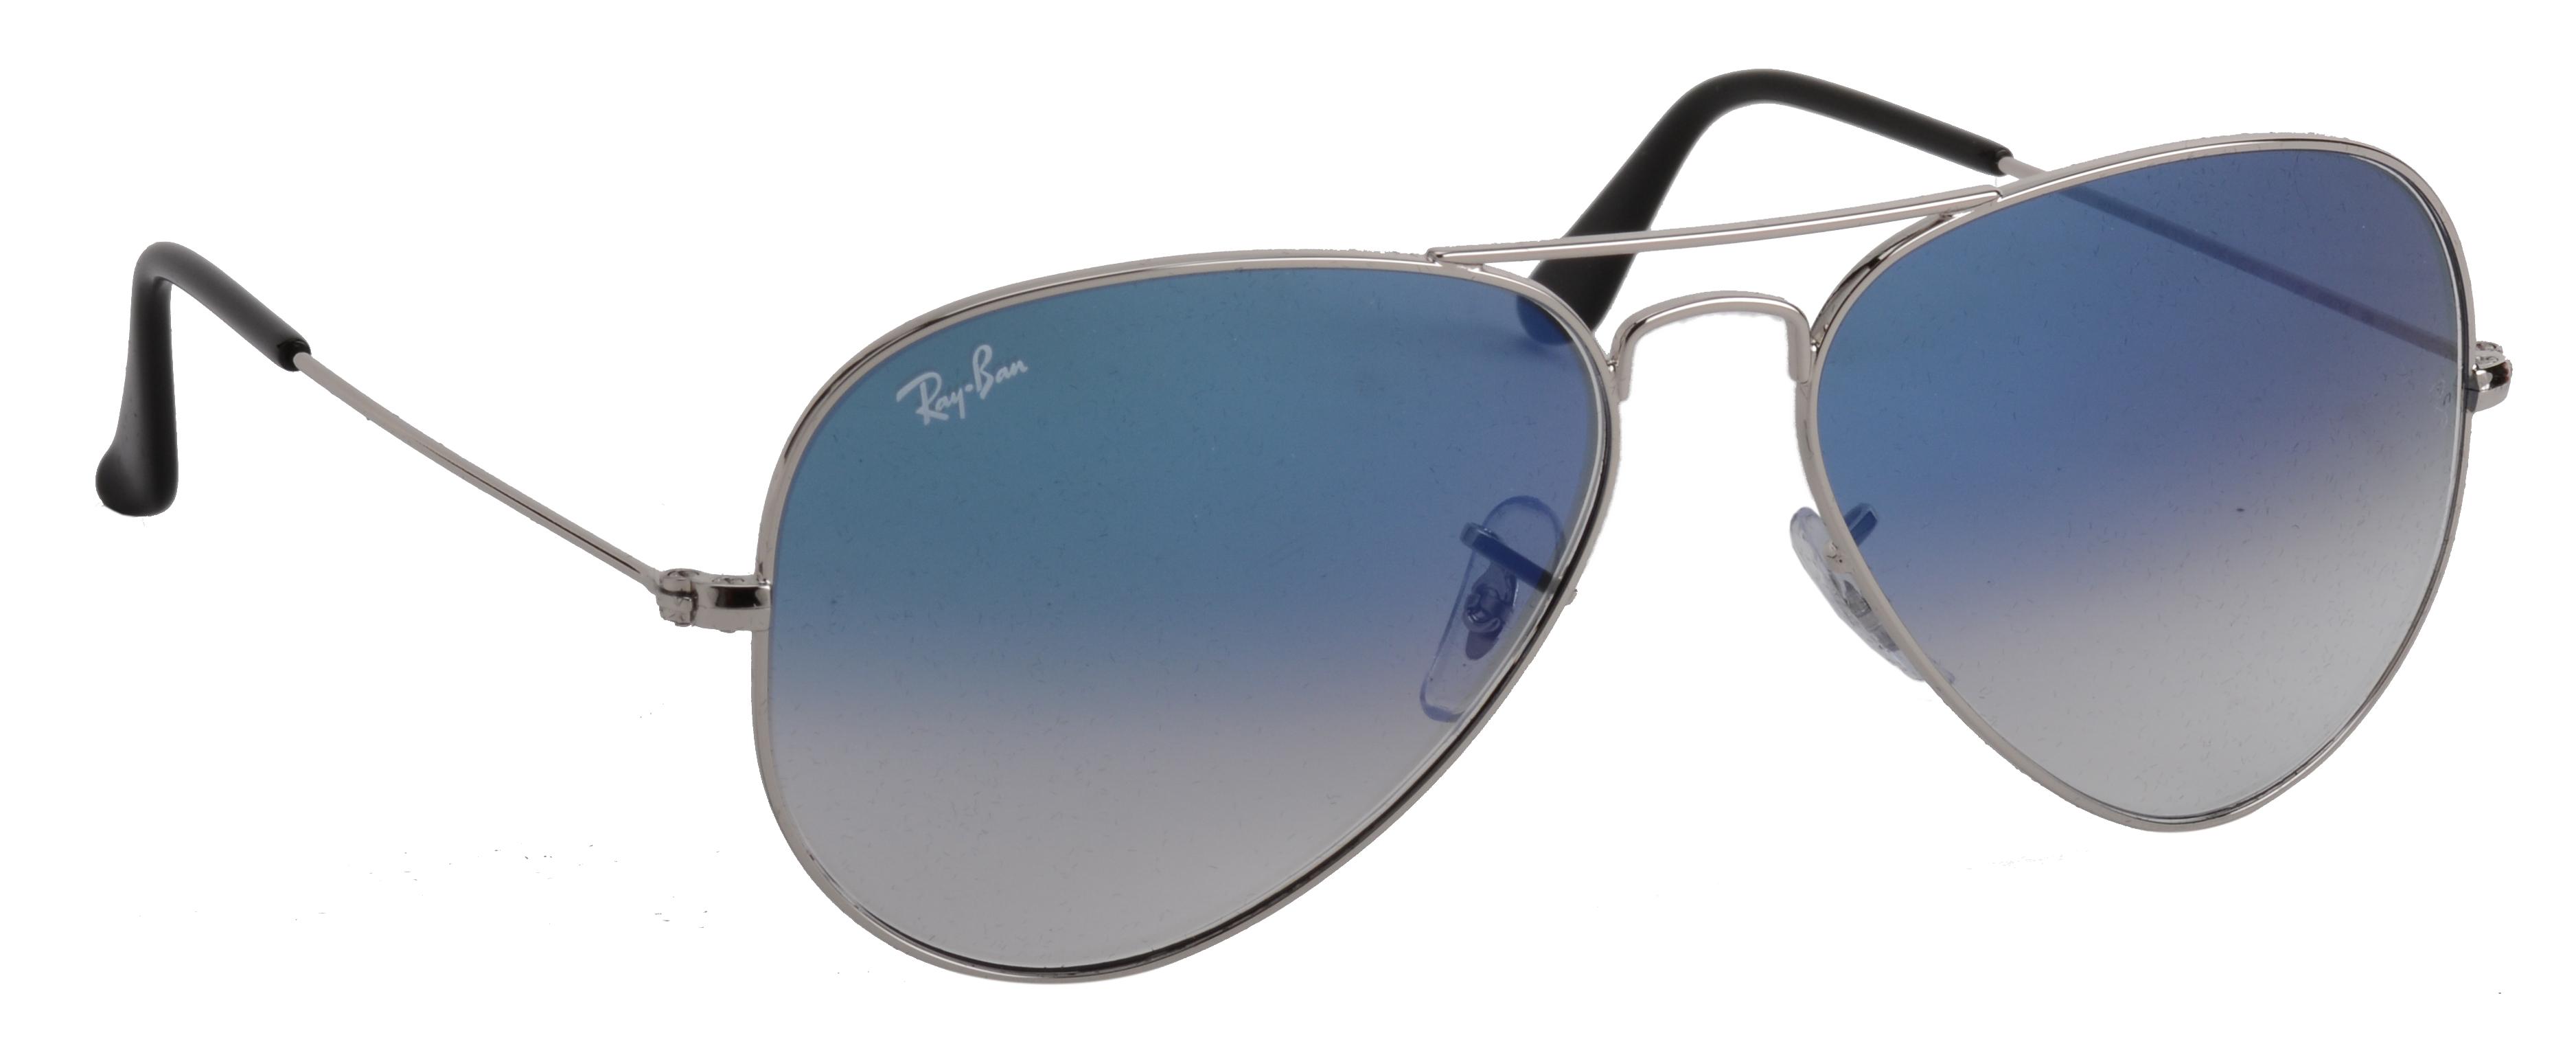 d8f8aa3747 Ebay Ray Ban Sunglasses Womens « Heritage Malta